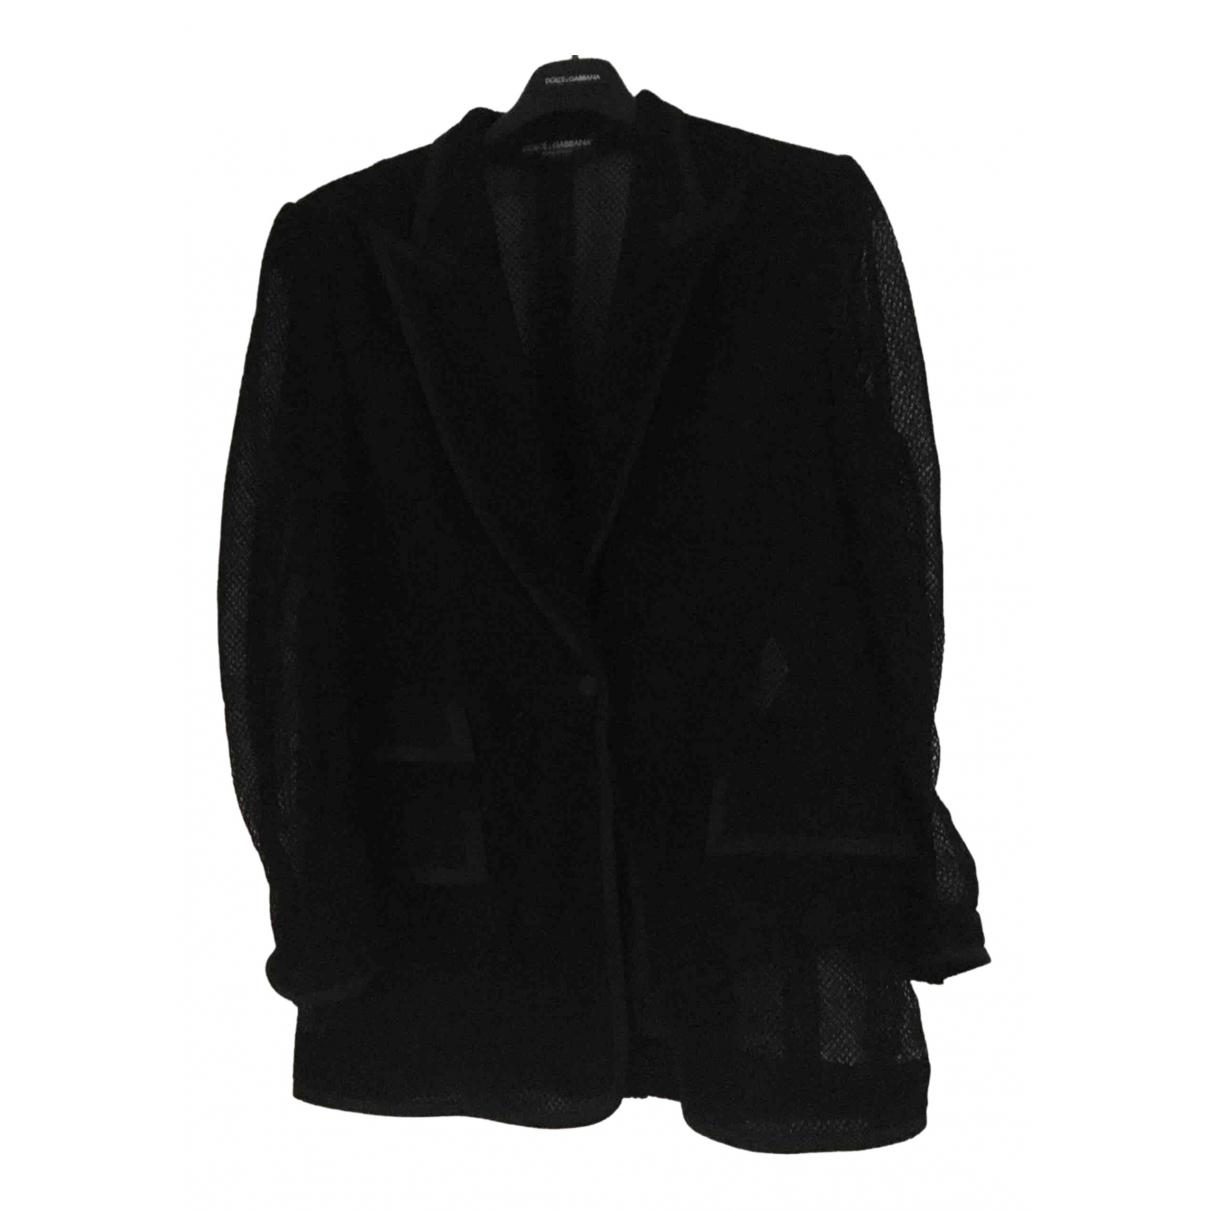 Dolce & Gabbana \N Black Cotton jacket for Women 48 IT